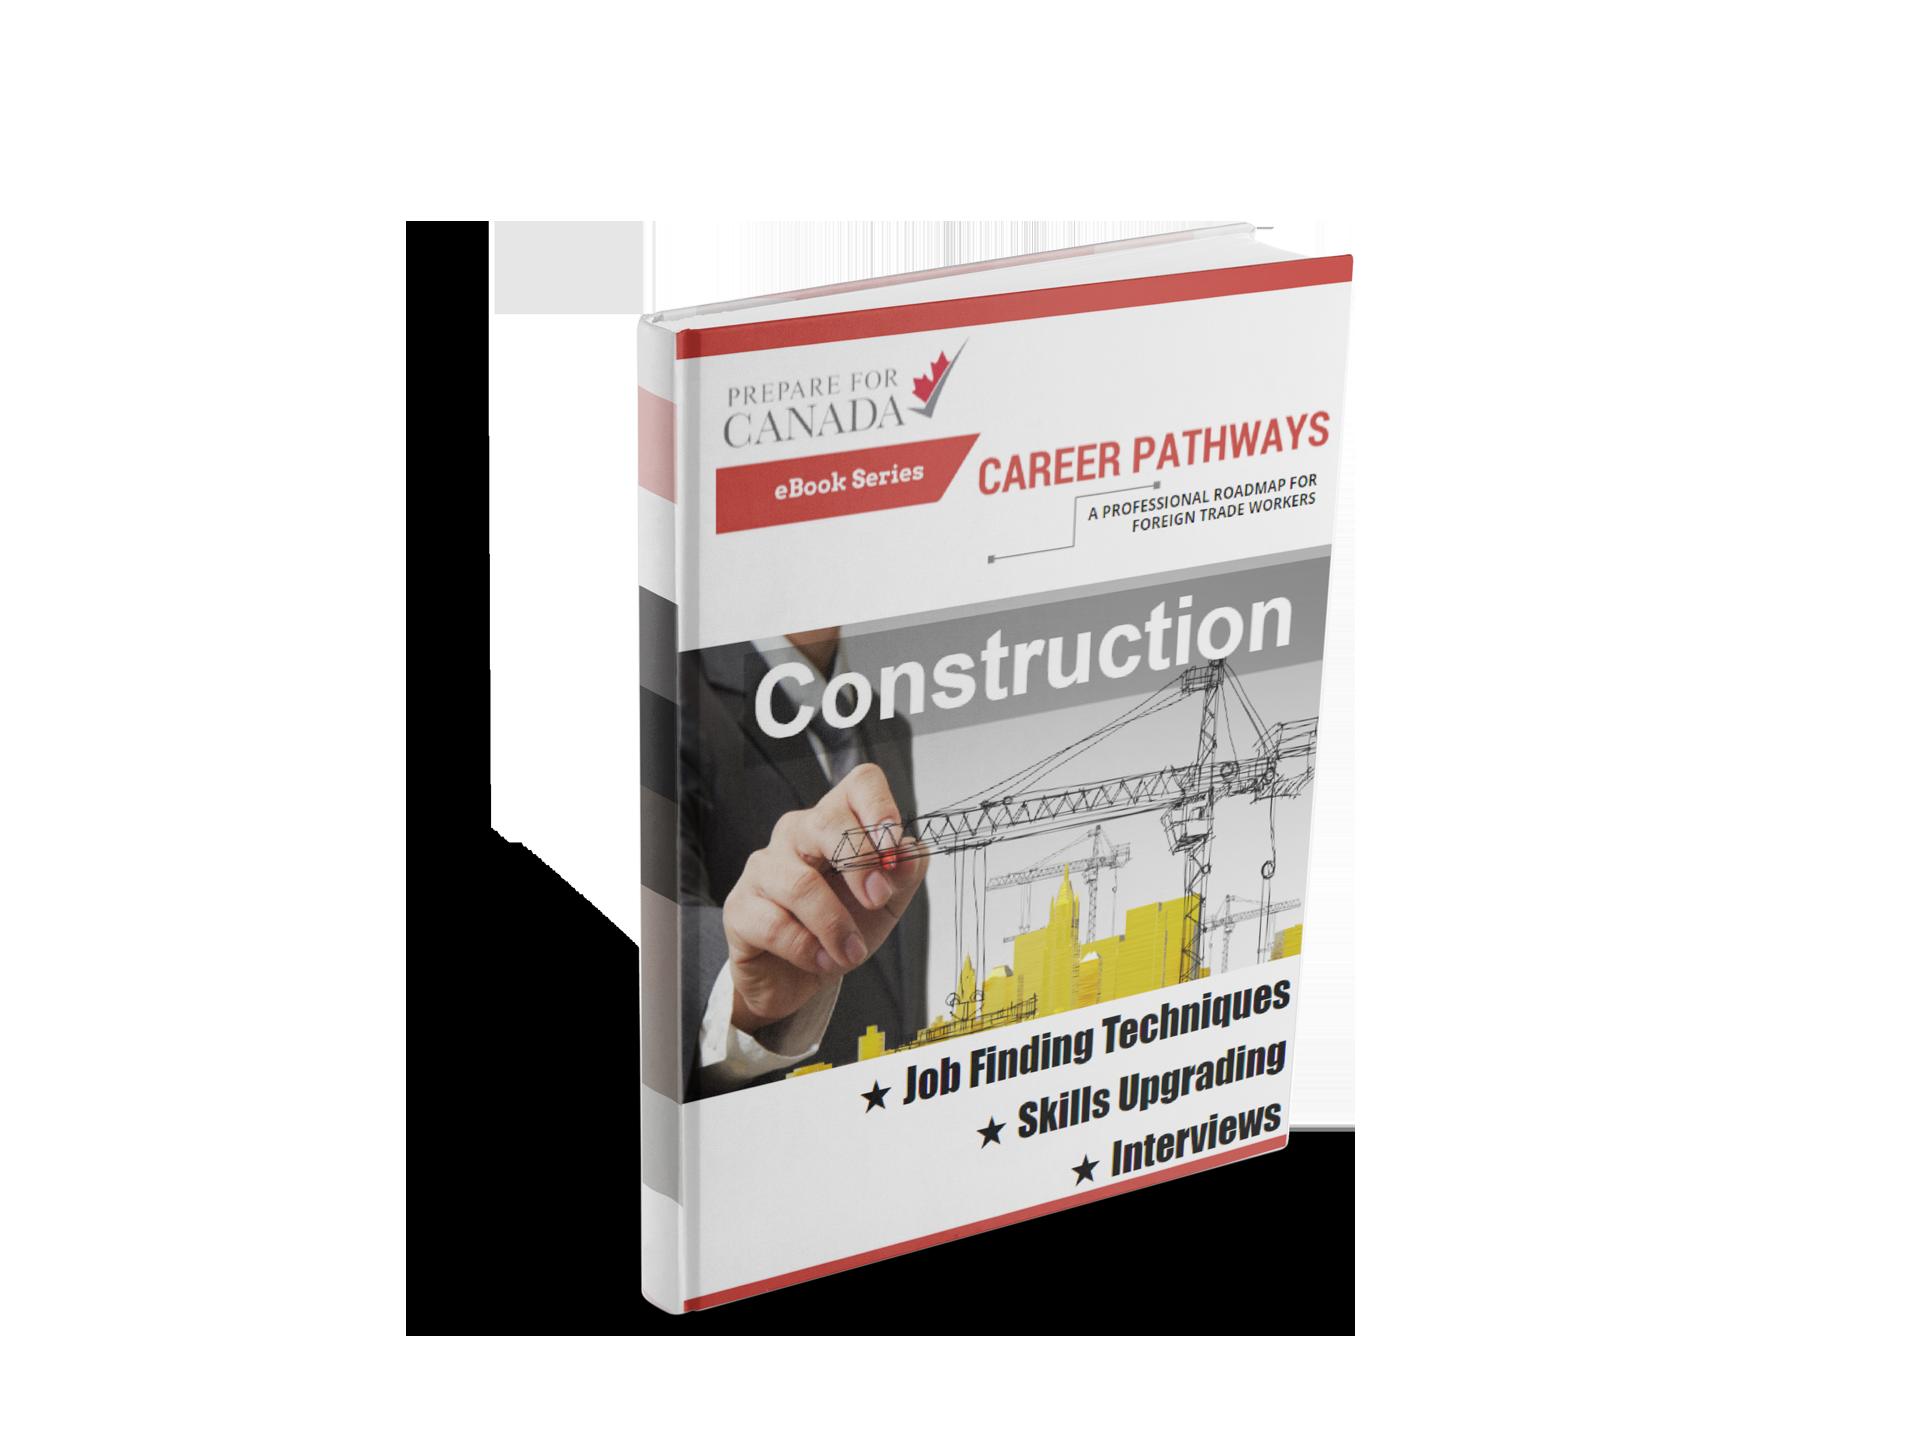 Construction Careers Ebook Download Now